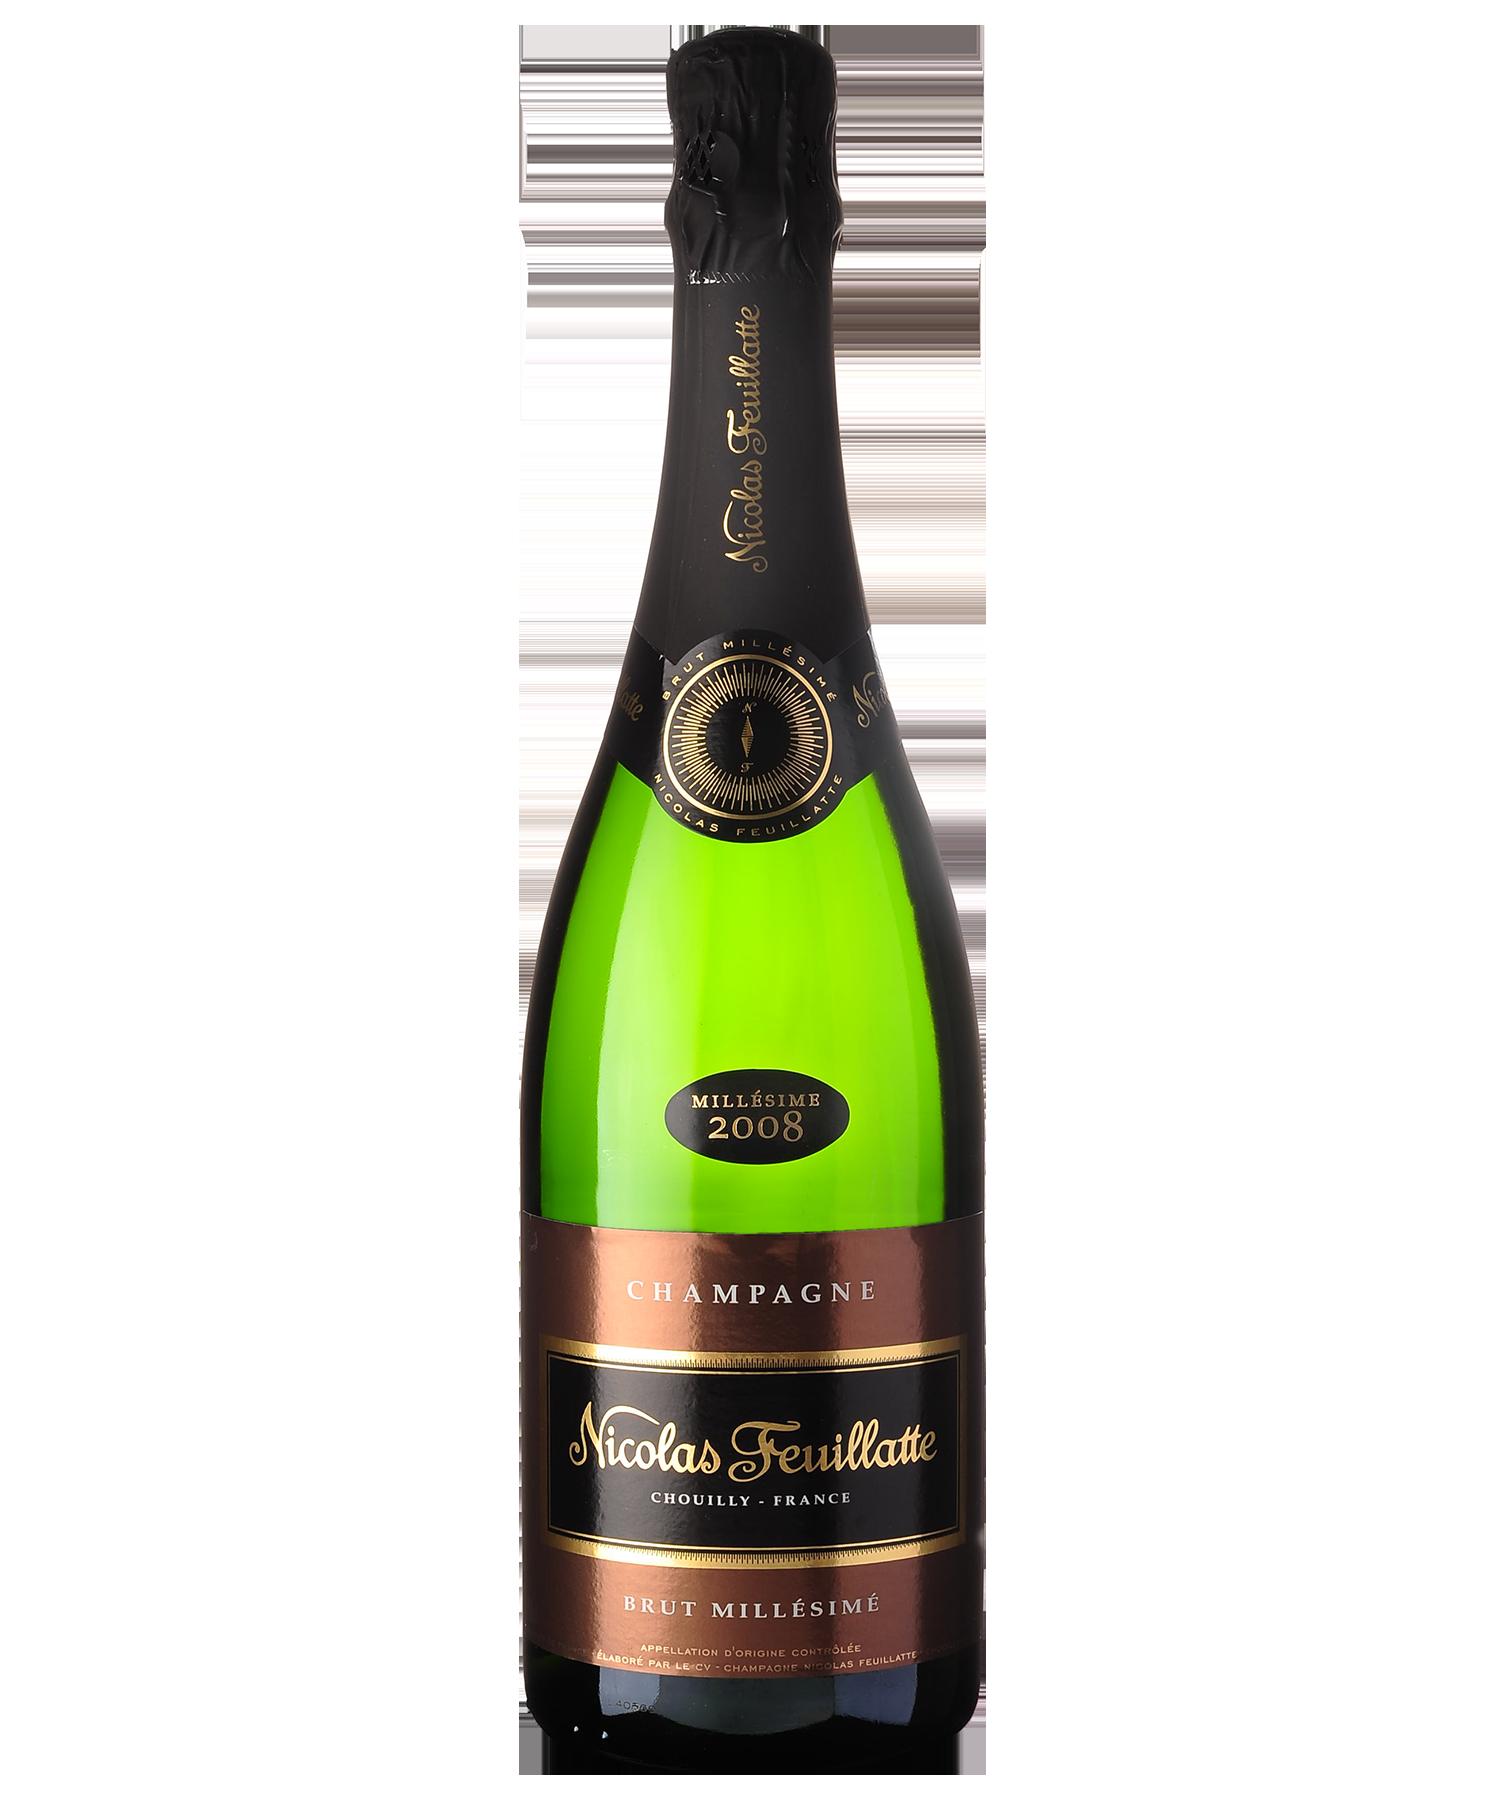 Champagne nicolas feuillatte millesime 2008